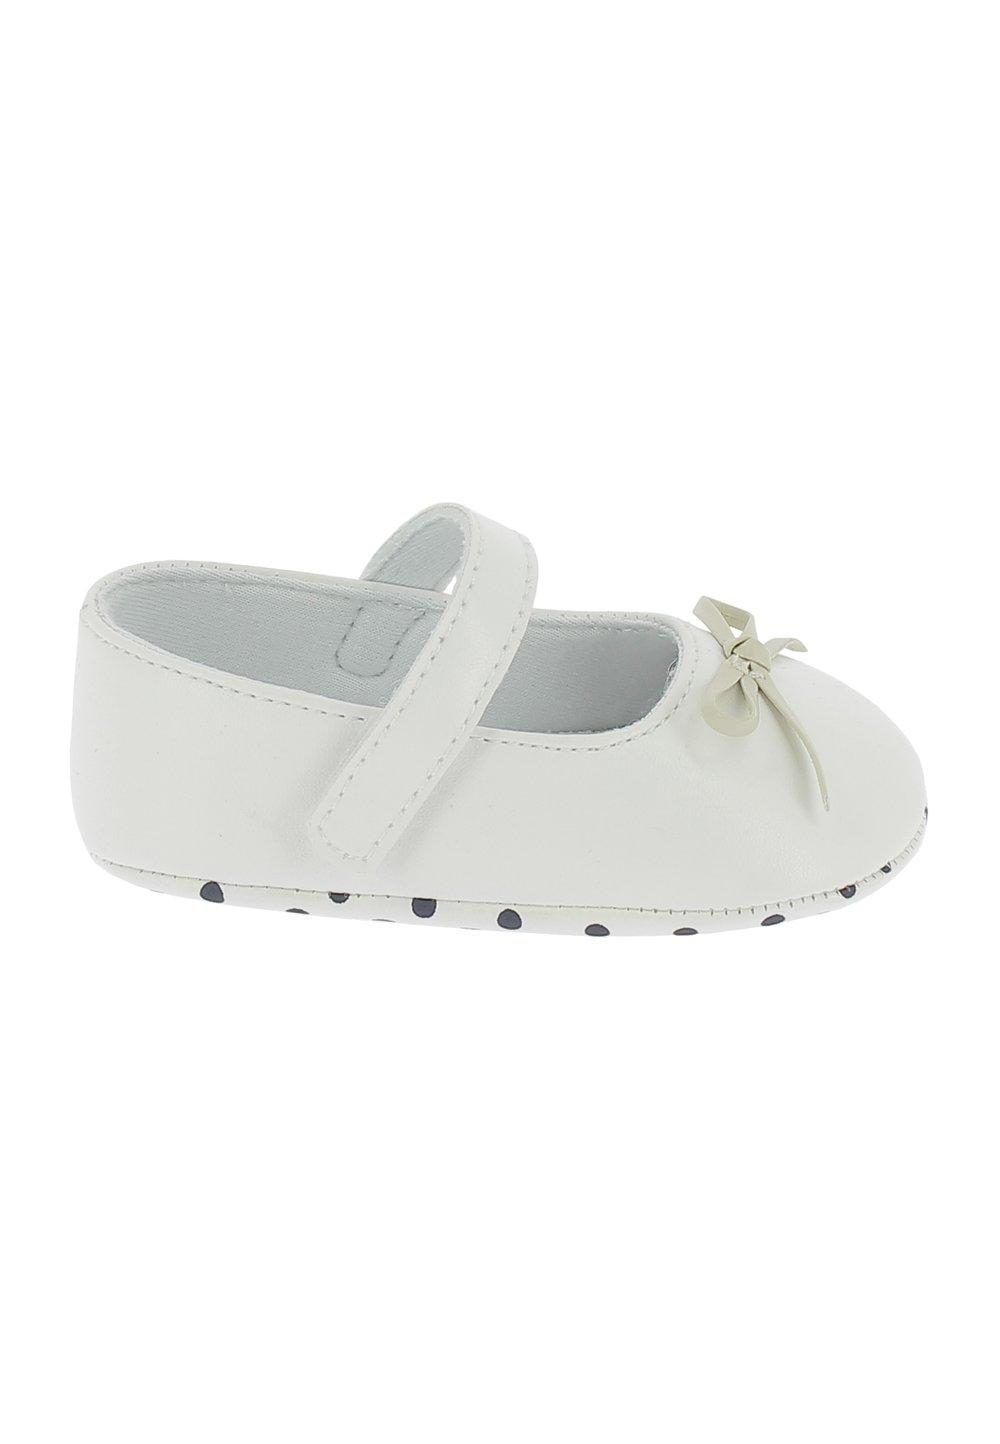 Papucei bebe, albi cu fundita imagine